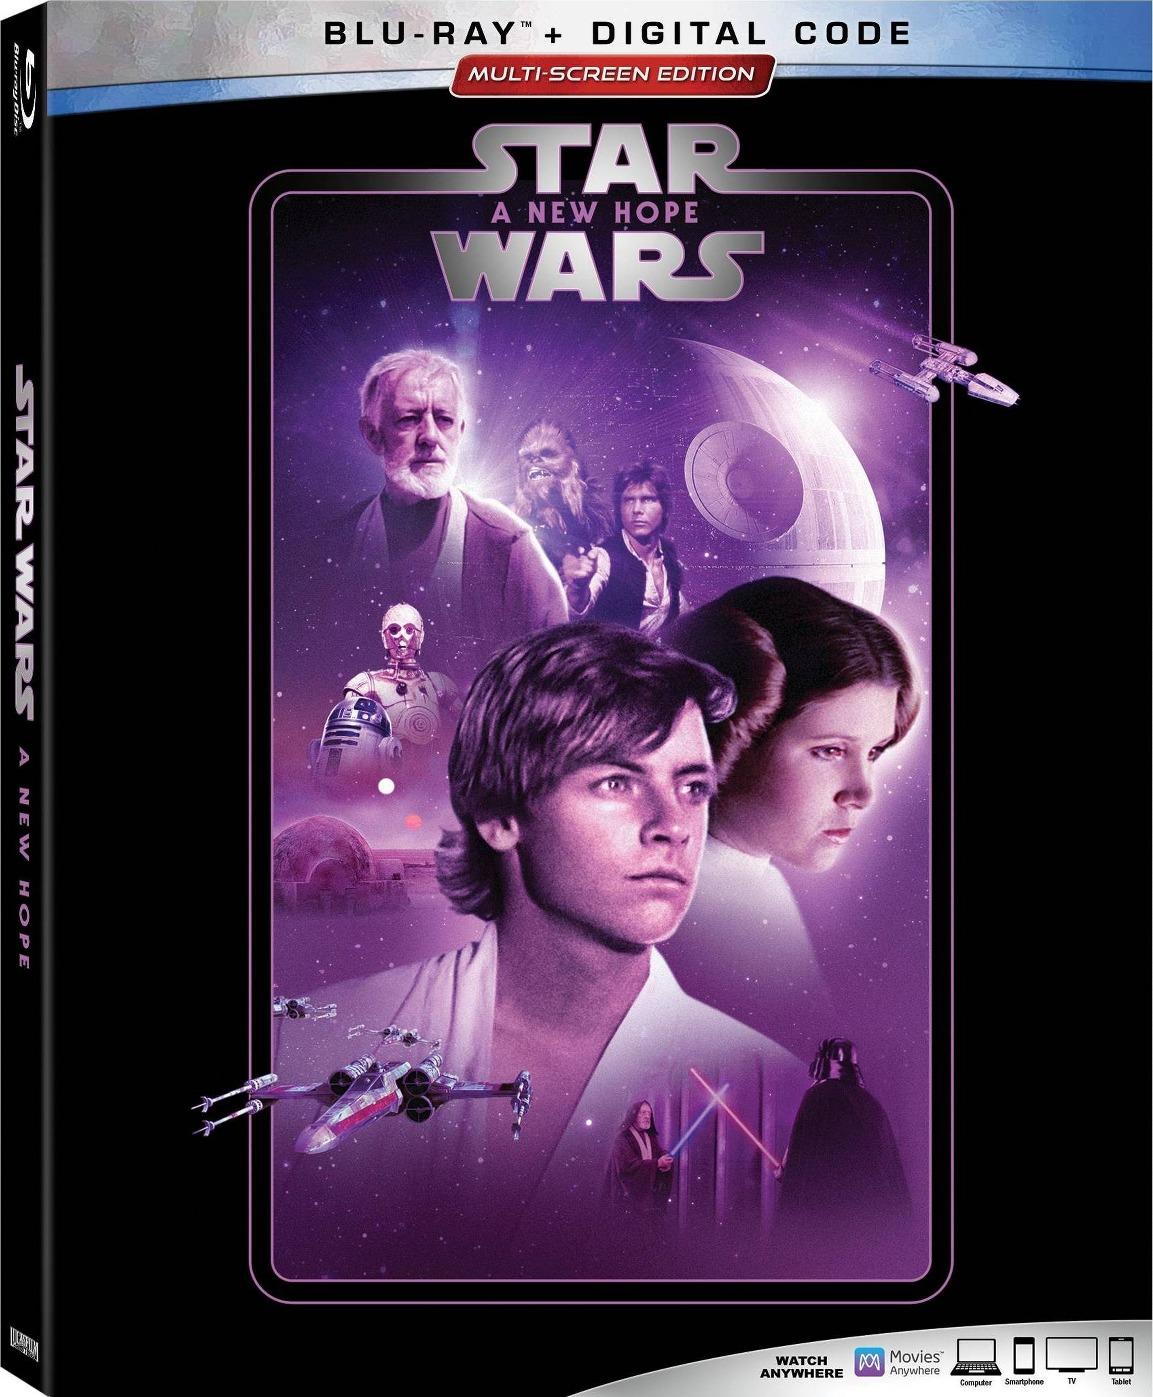 Star Wars (1977) Star Wars: Episode IV - A New Hope [35mm No-DNR Edition]